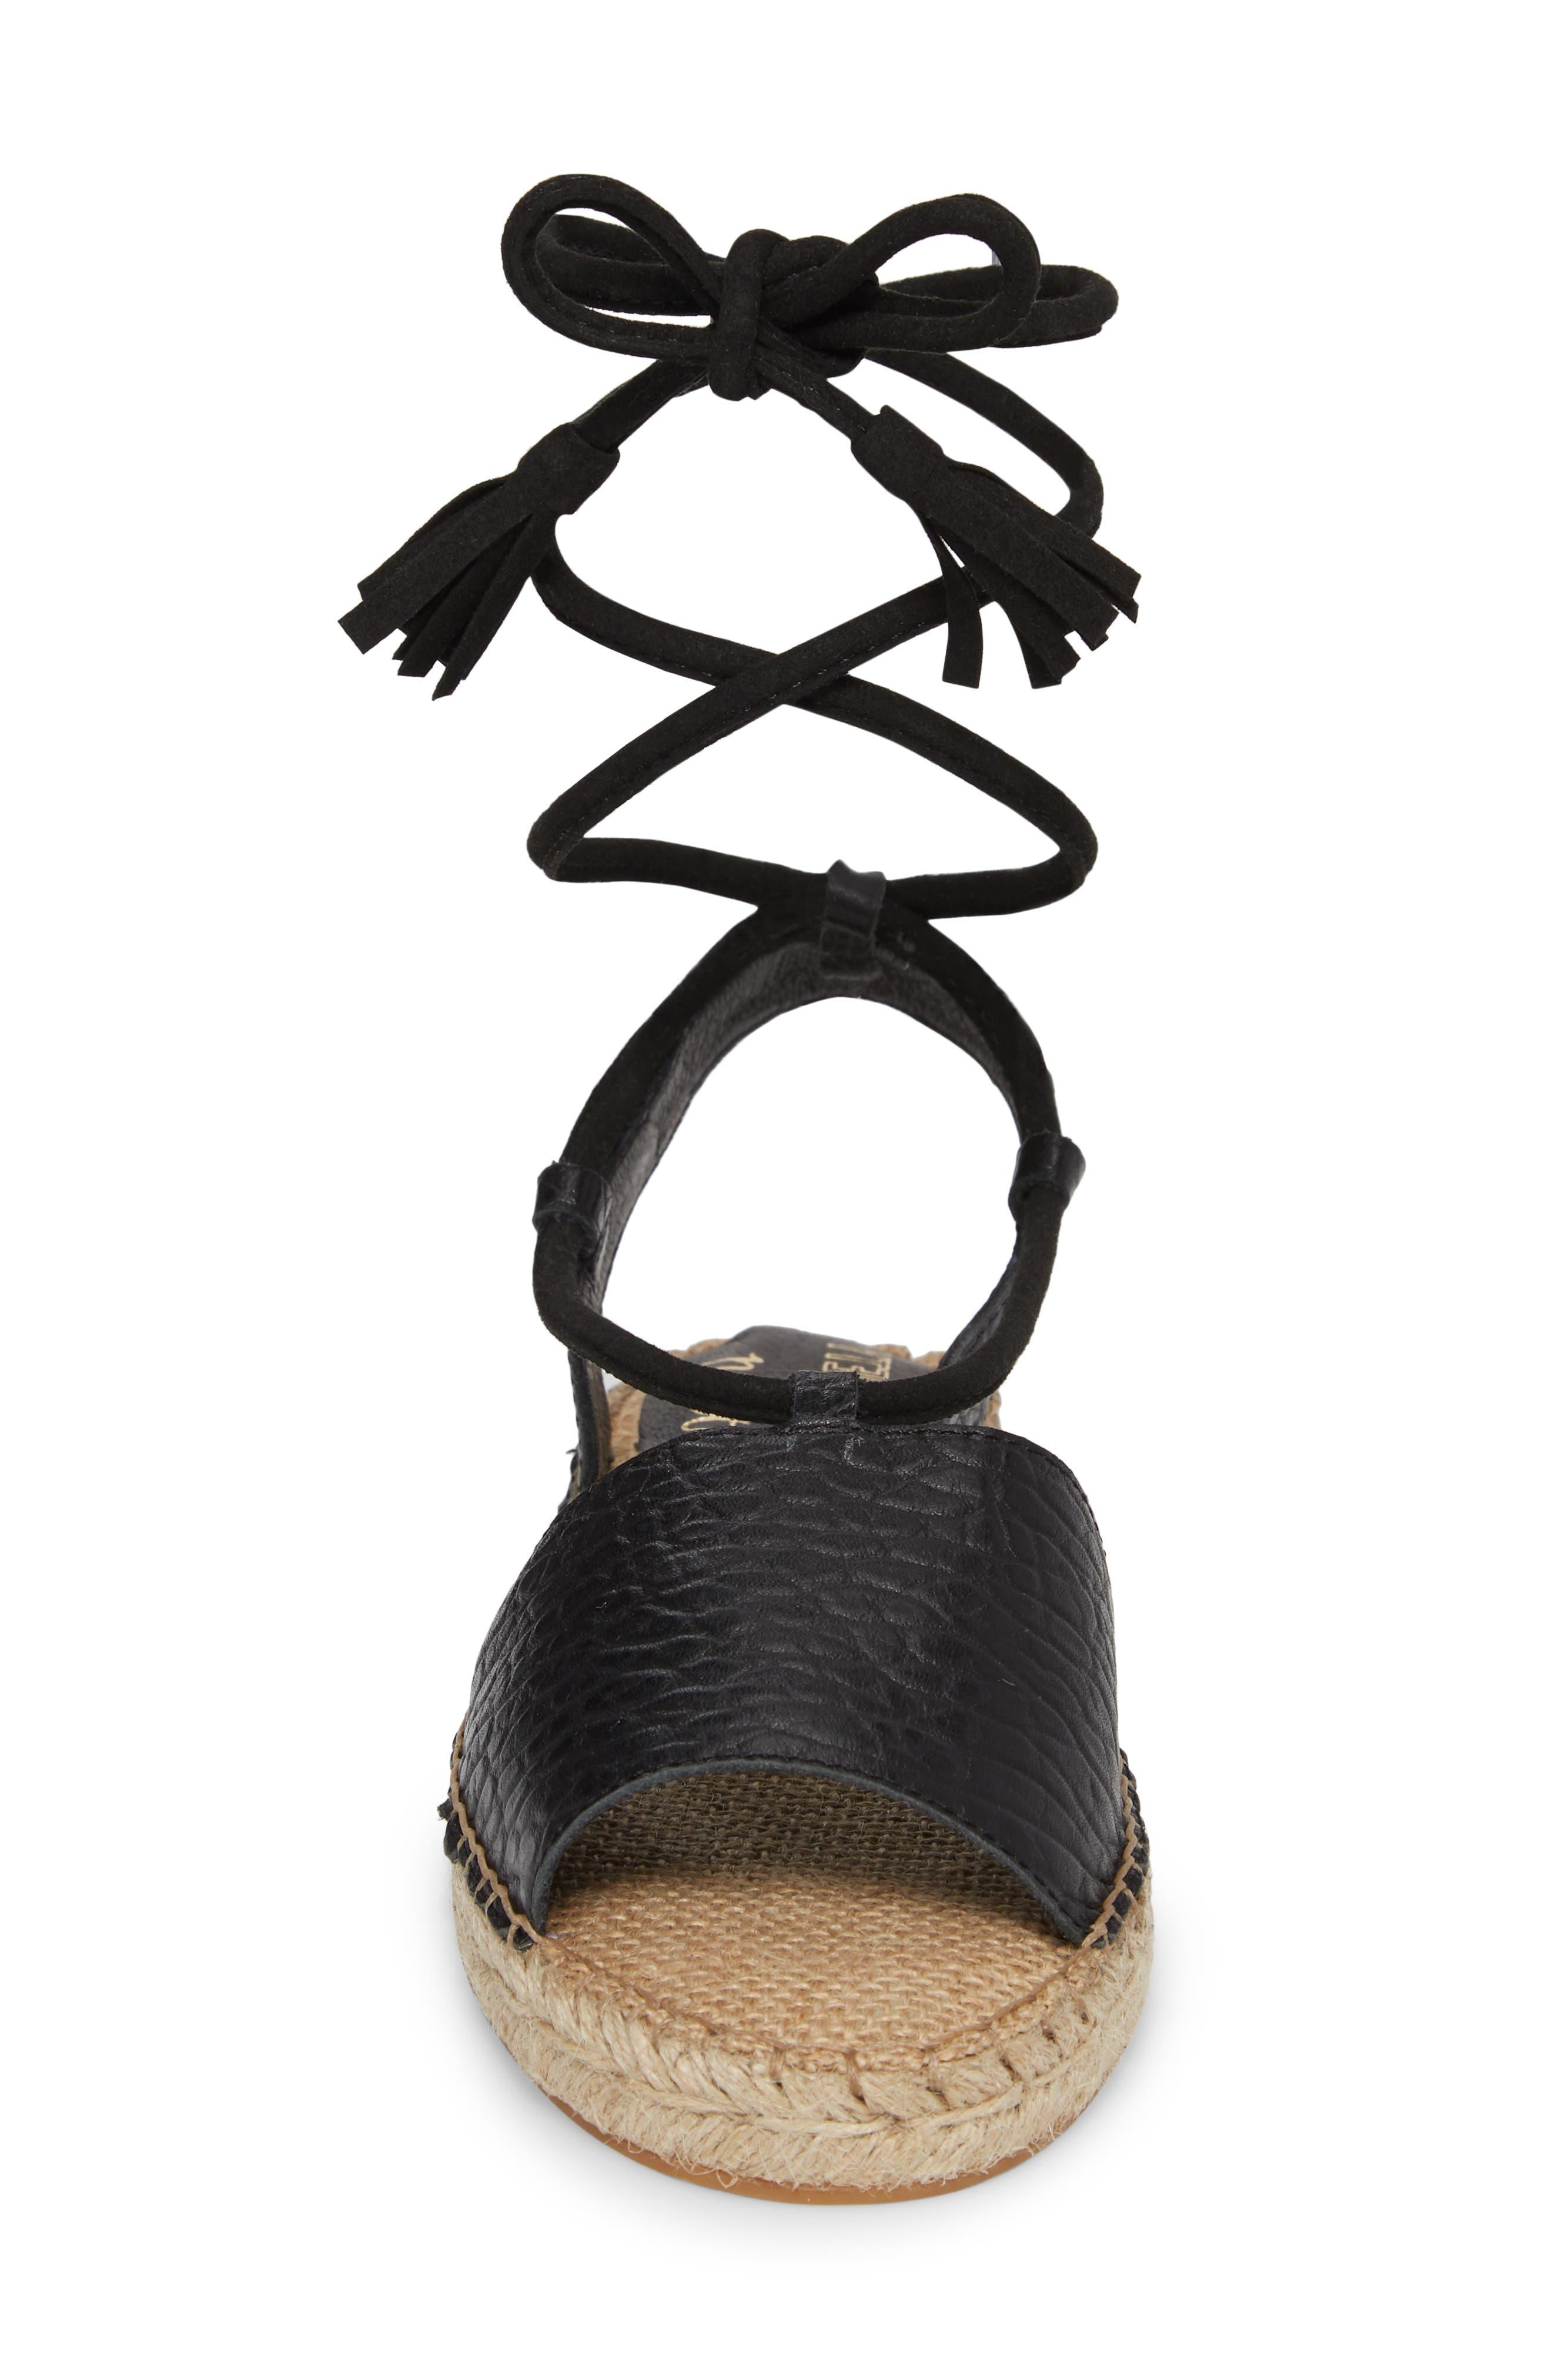 Amuse Society x Matisse La Vita Sandal,                             Alternate thumbnail 4, color,                             BLACK LEATHER